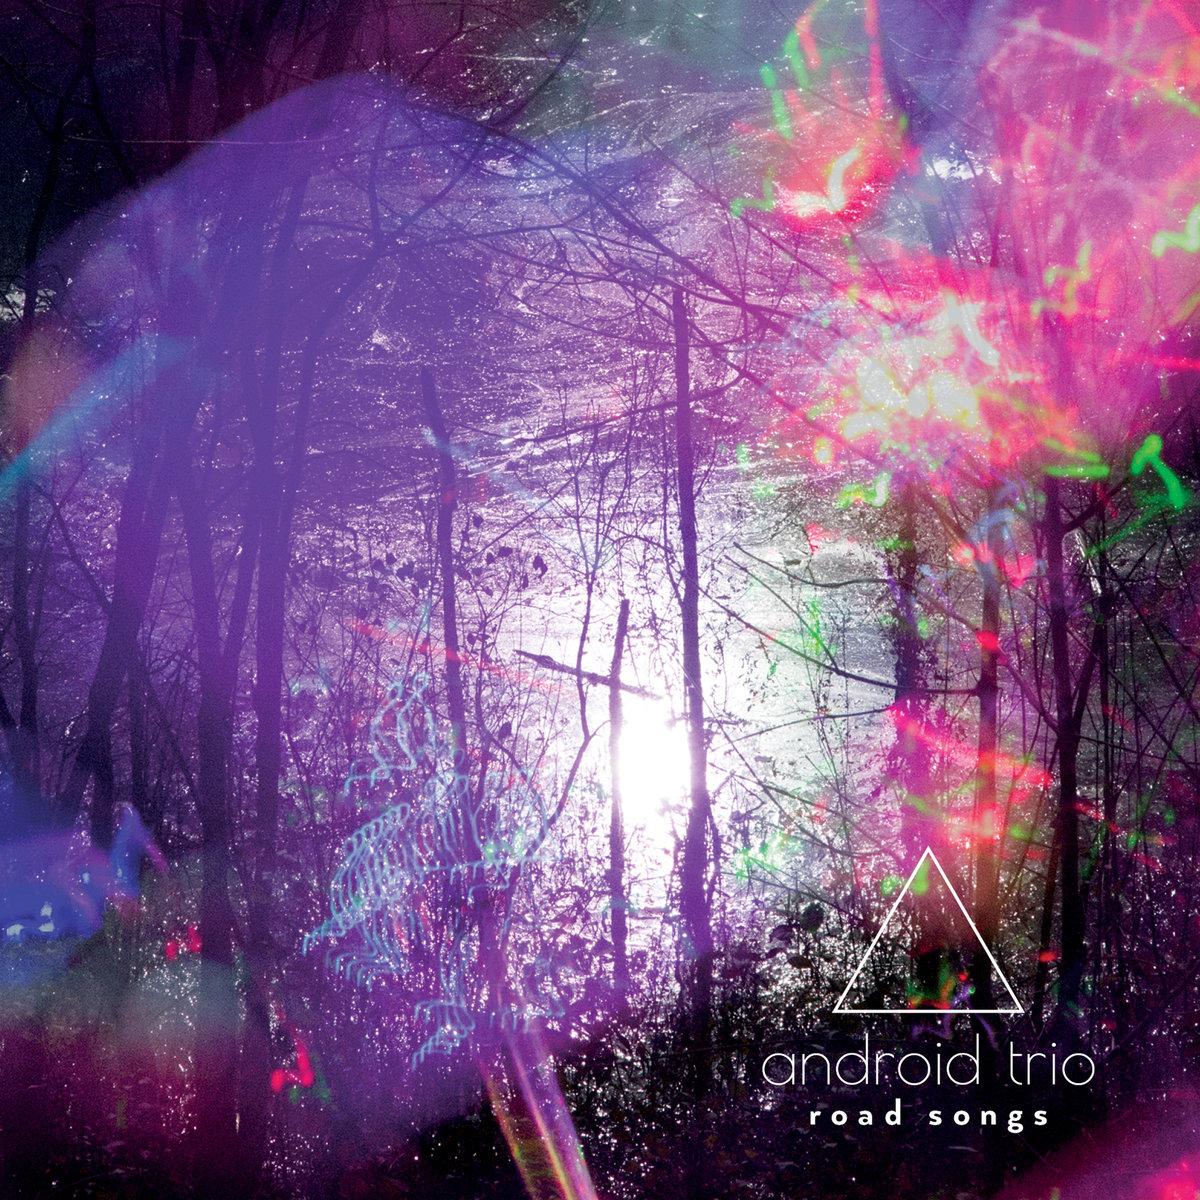 0043 Android Trio Road Songs.jpg